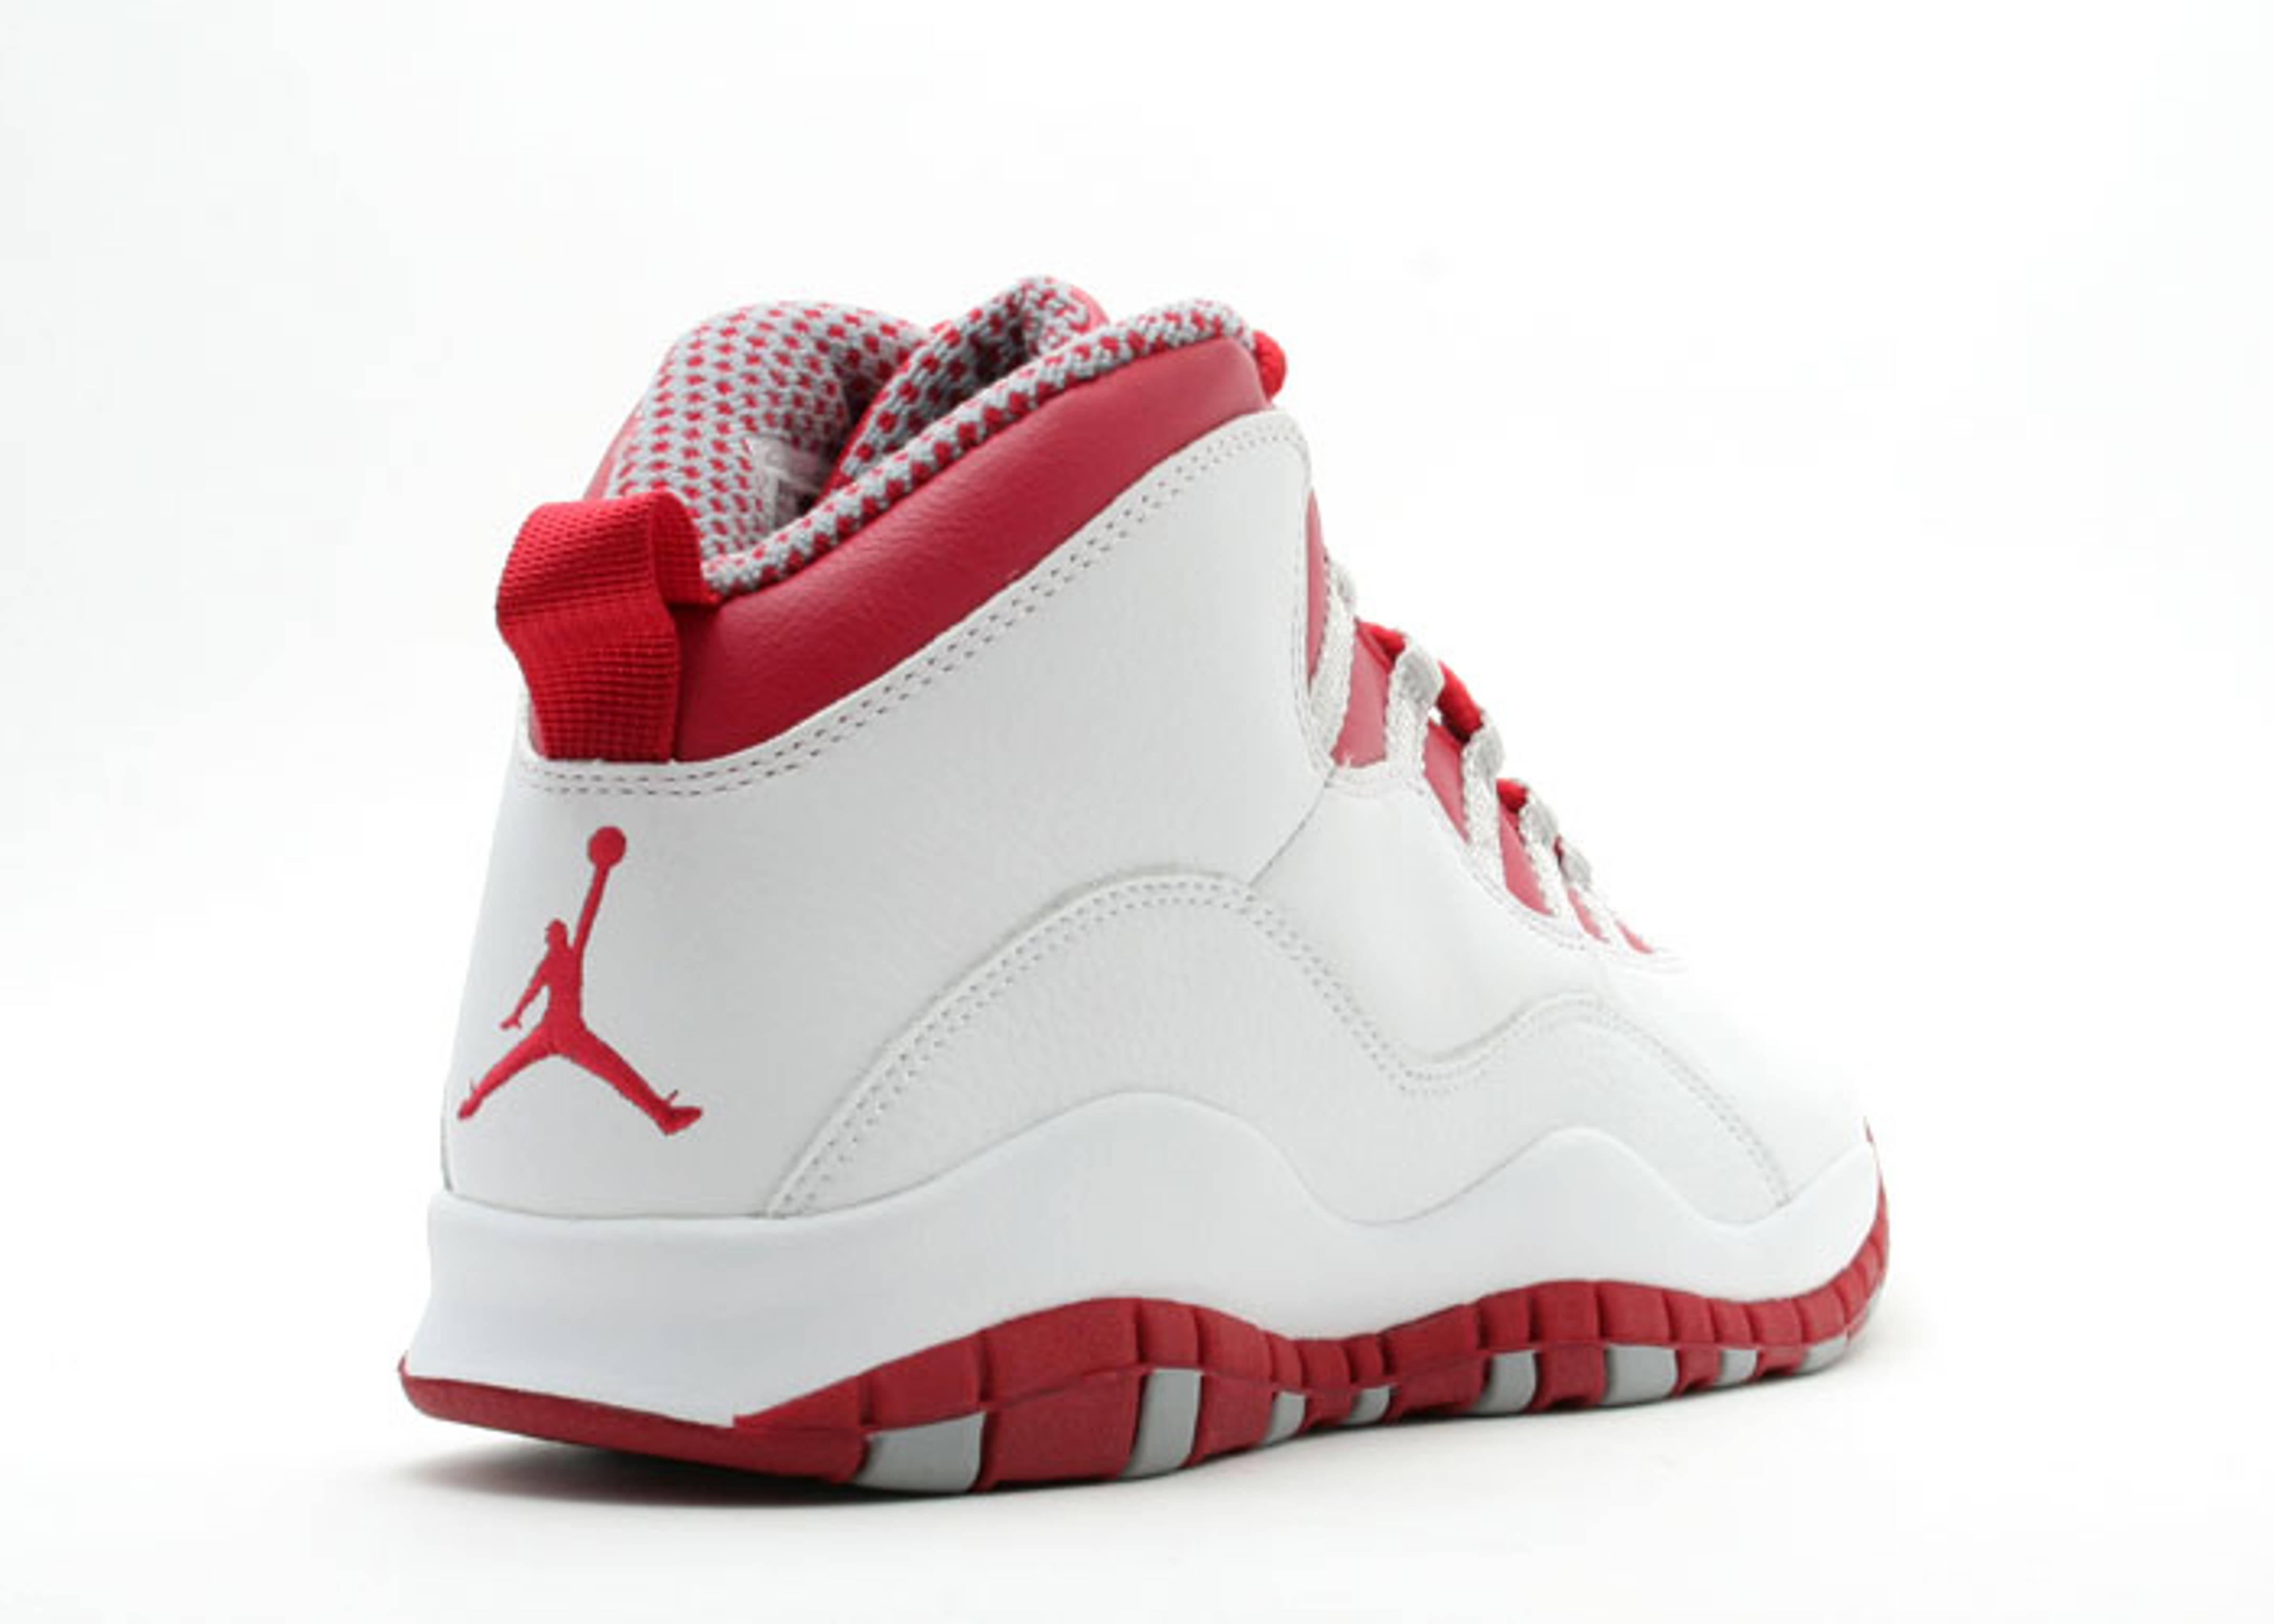 Jordan 10 Red 5.5 Size Four Jordans - 153.6KB